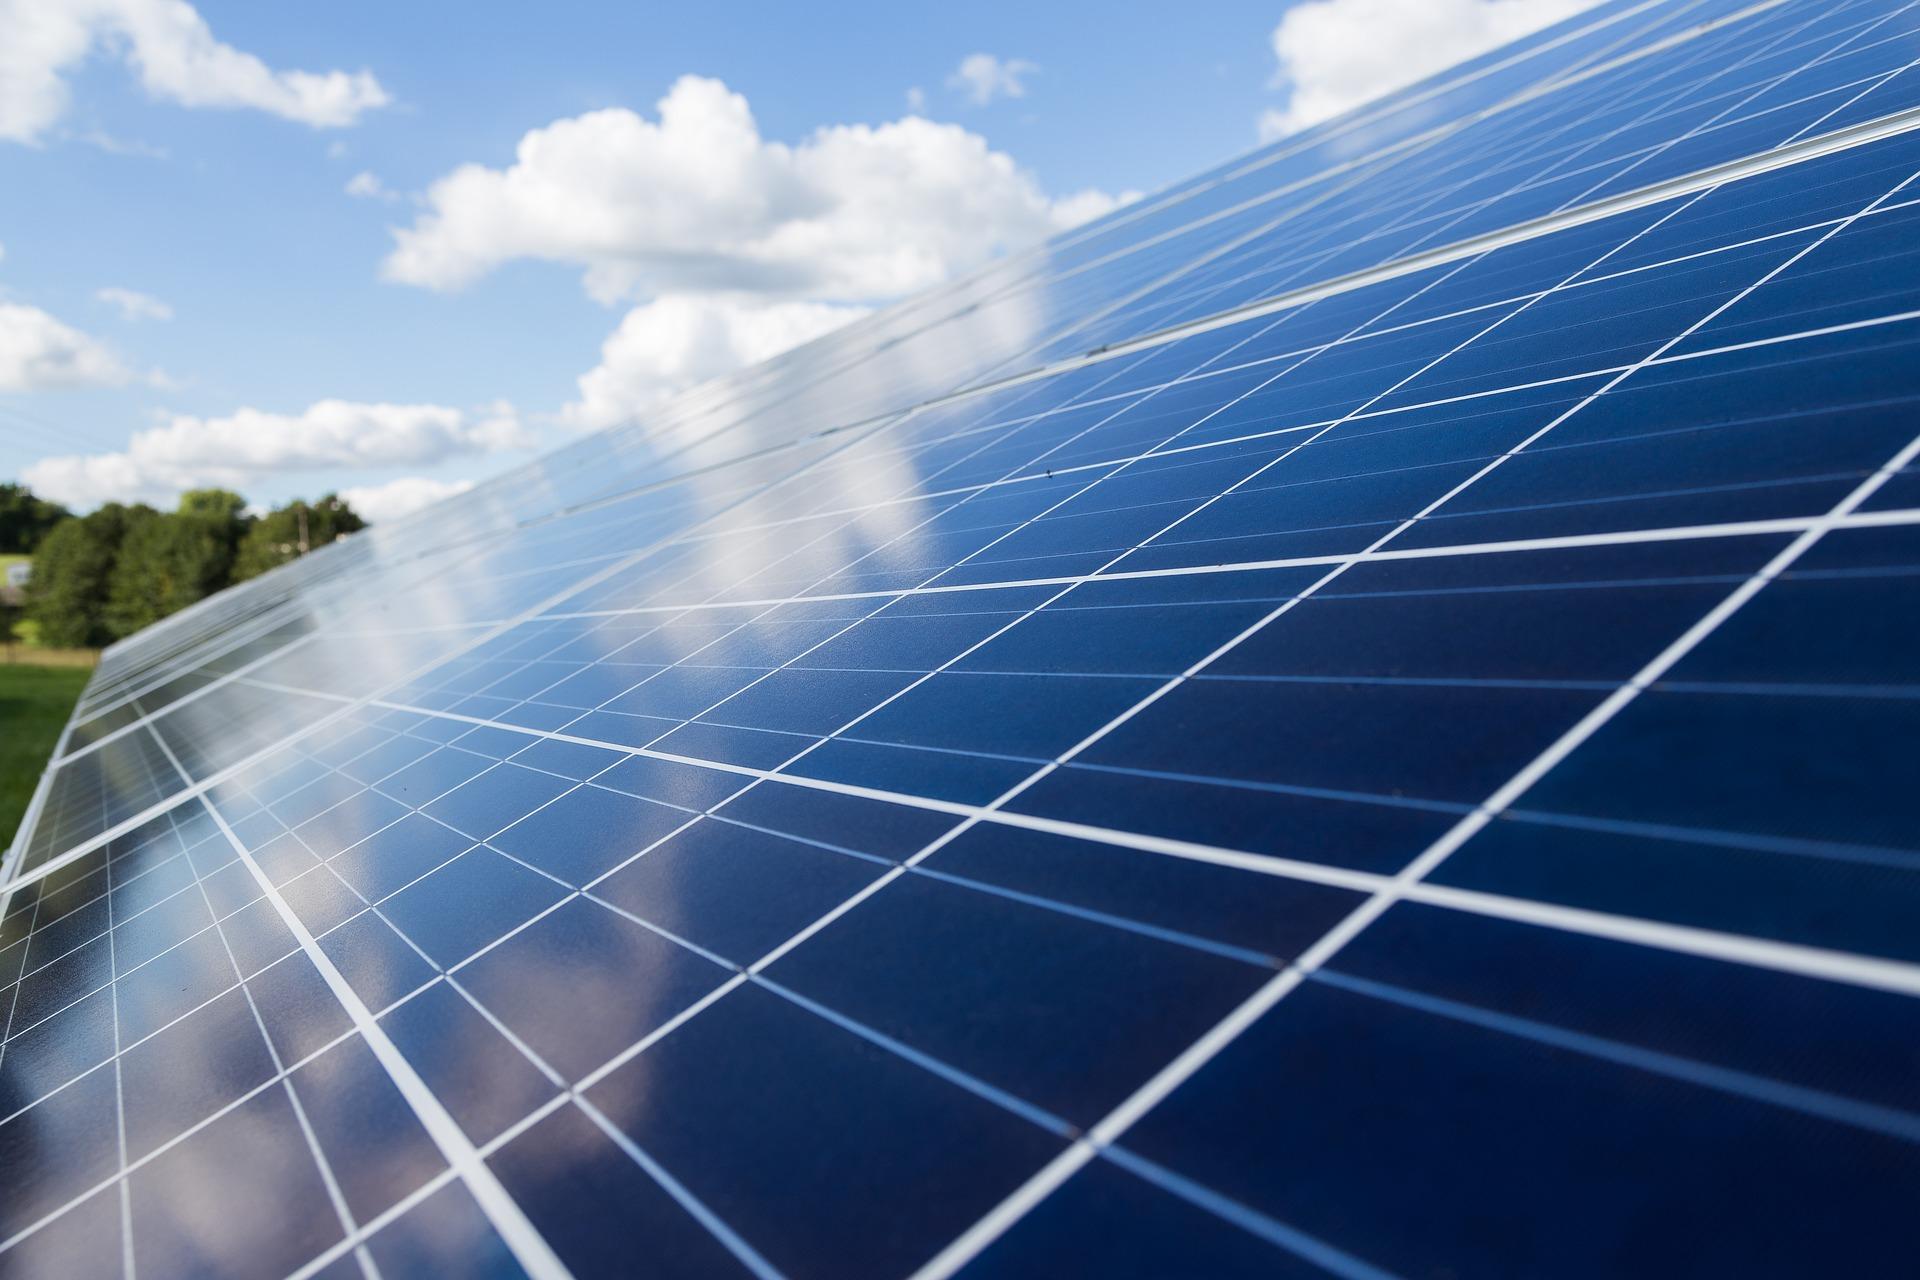 solar_solaranlage_Sonne